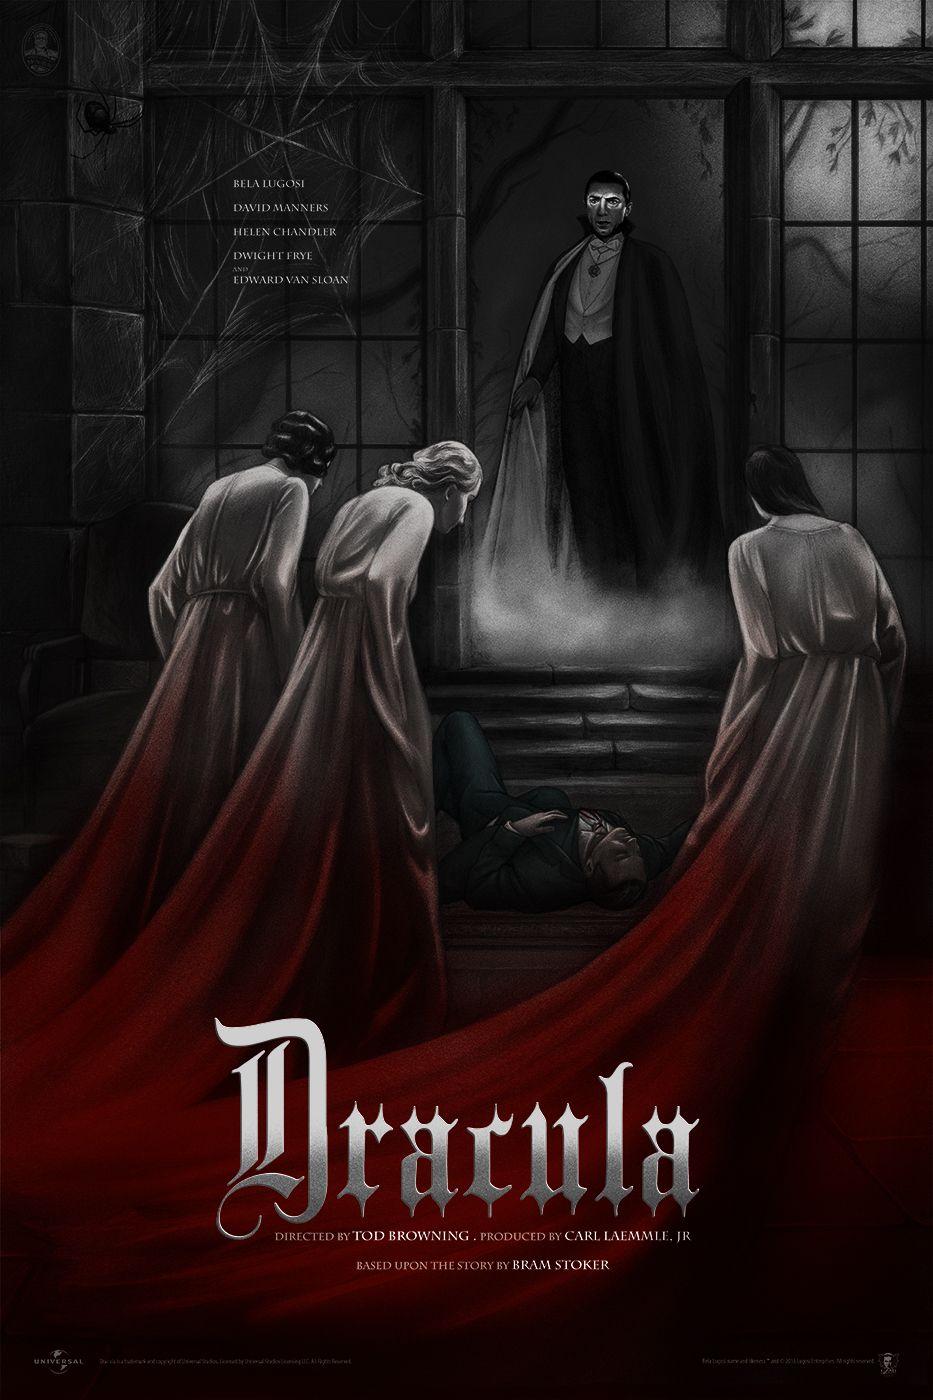 Jonathan Burton Dracula Posters for MondoCon | Collider